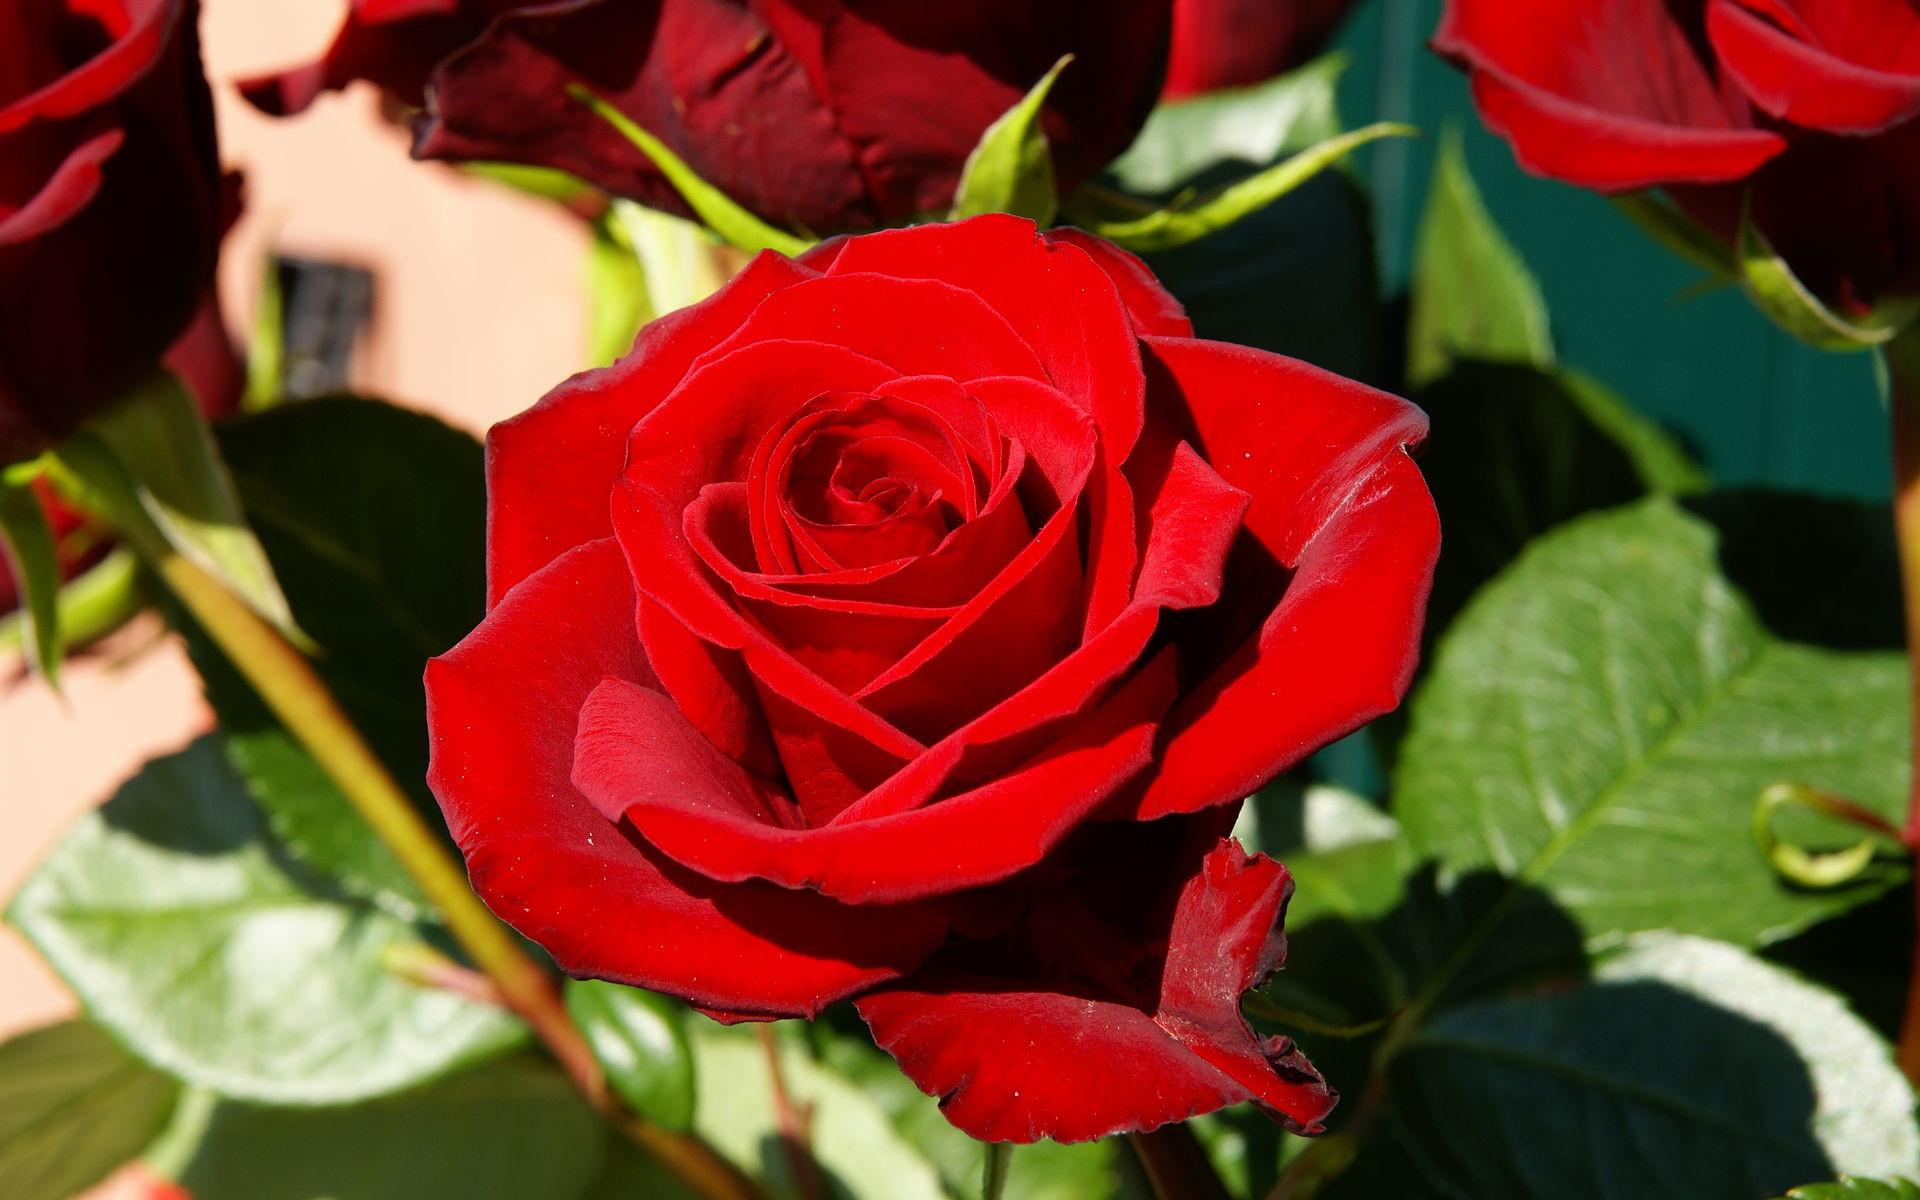 Flower Wallpaper Red Rose 63 Images